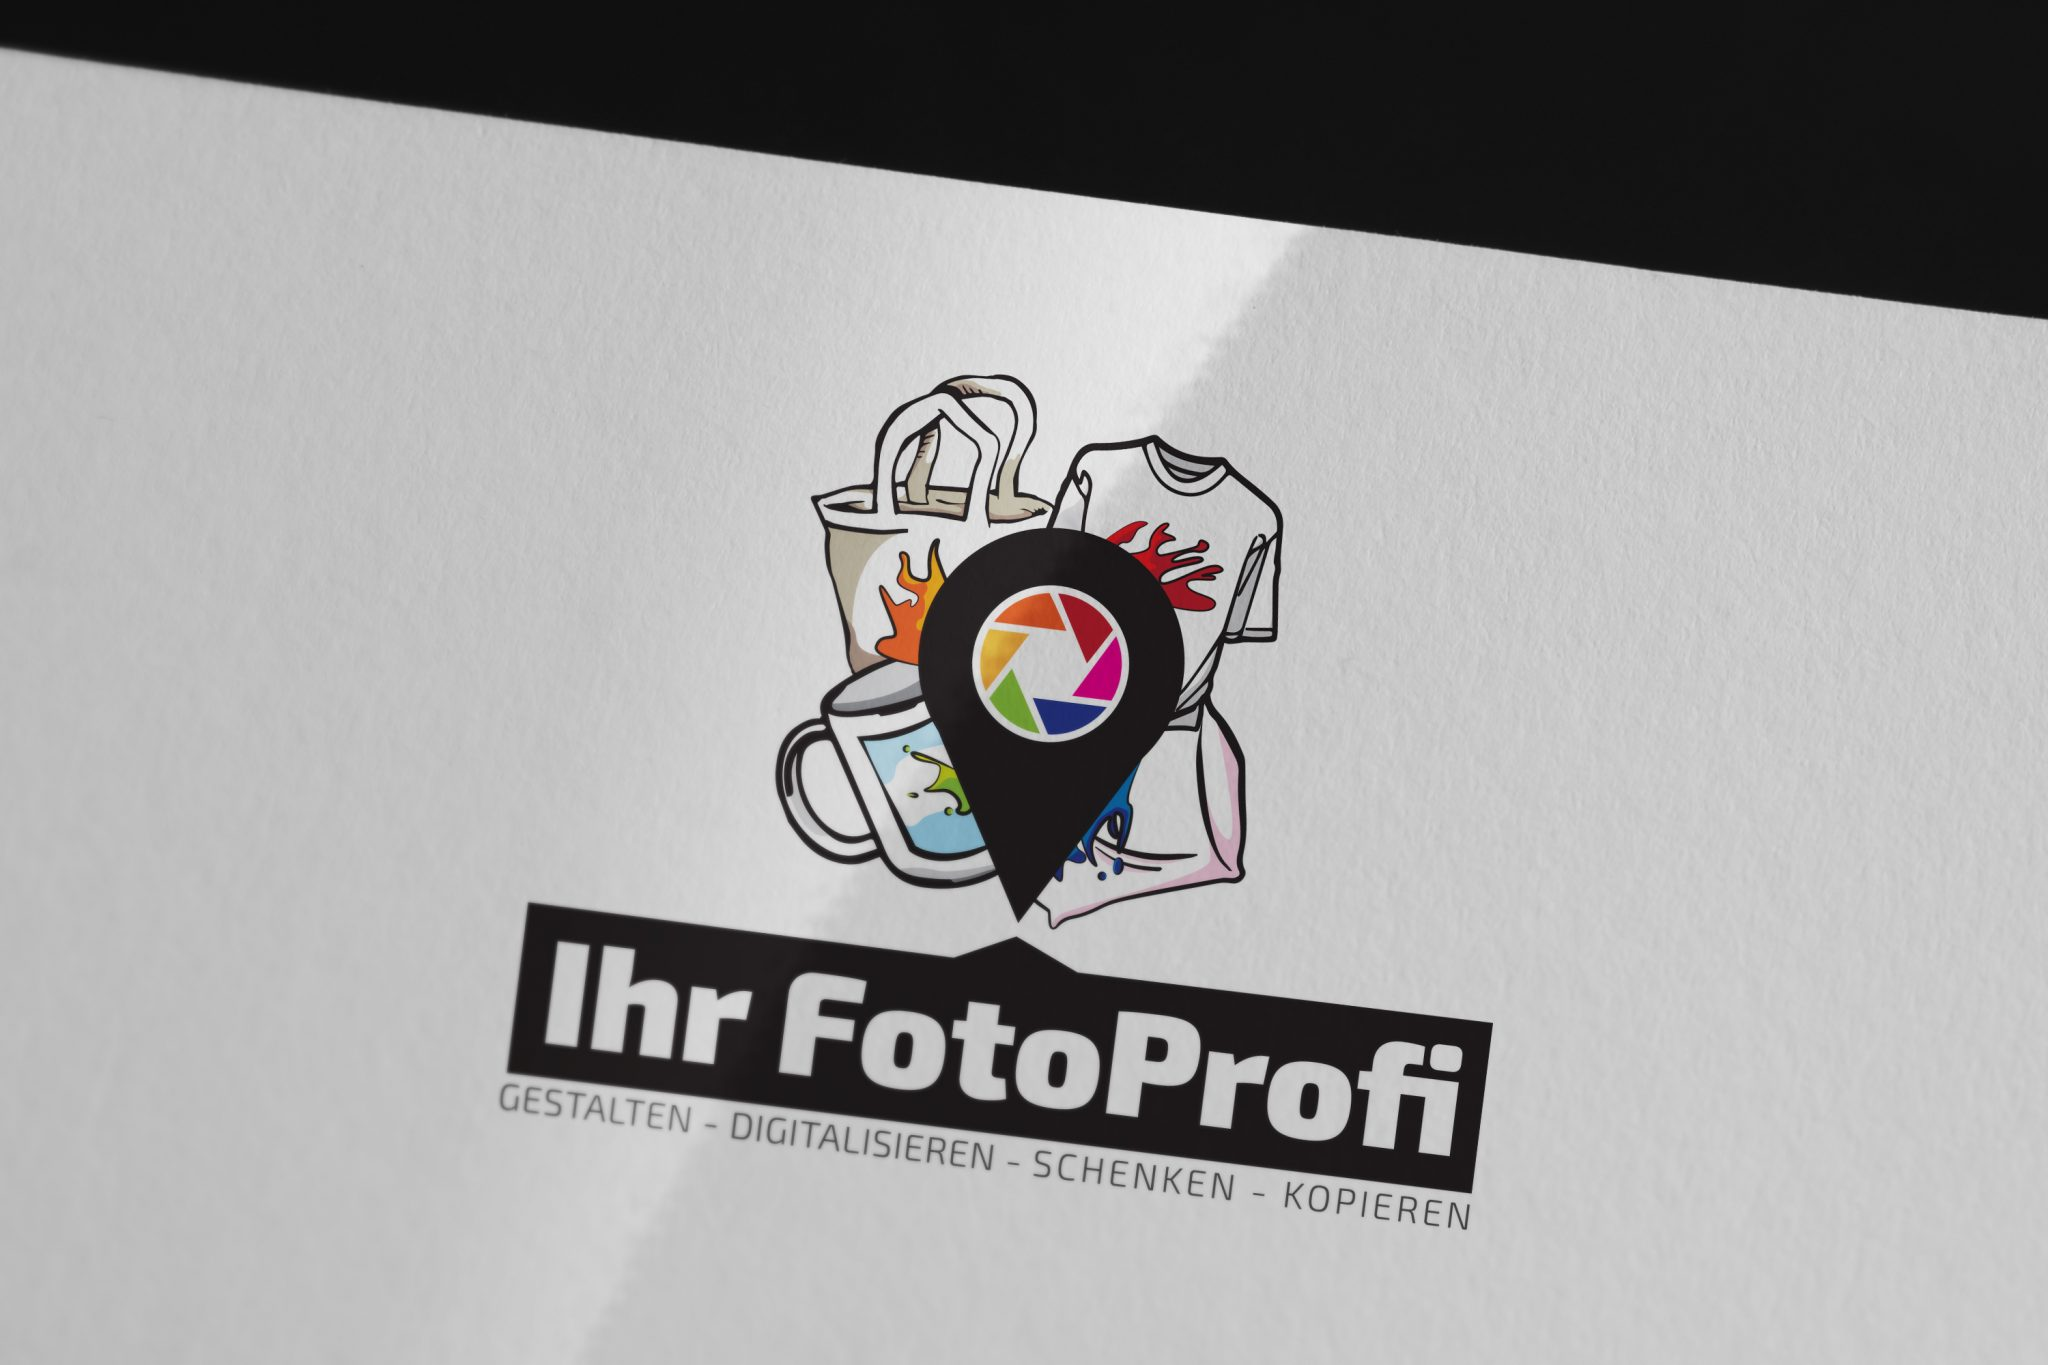 Logo Ihr FotoProfi